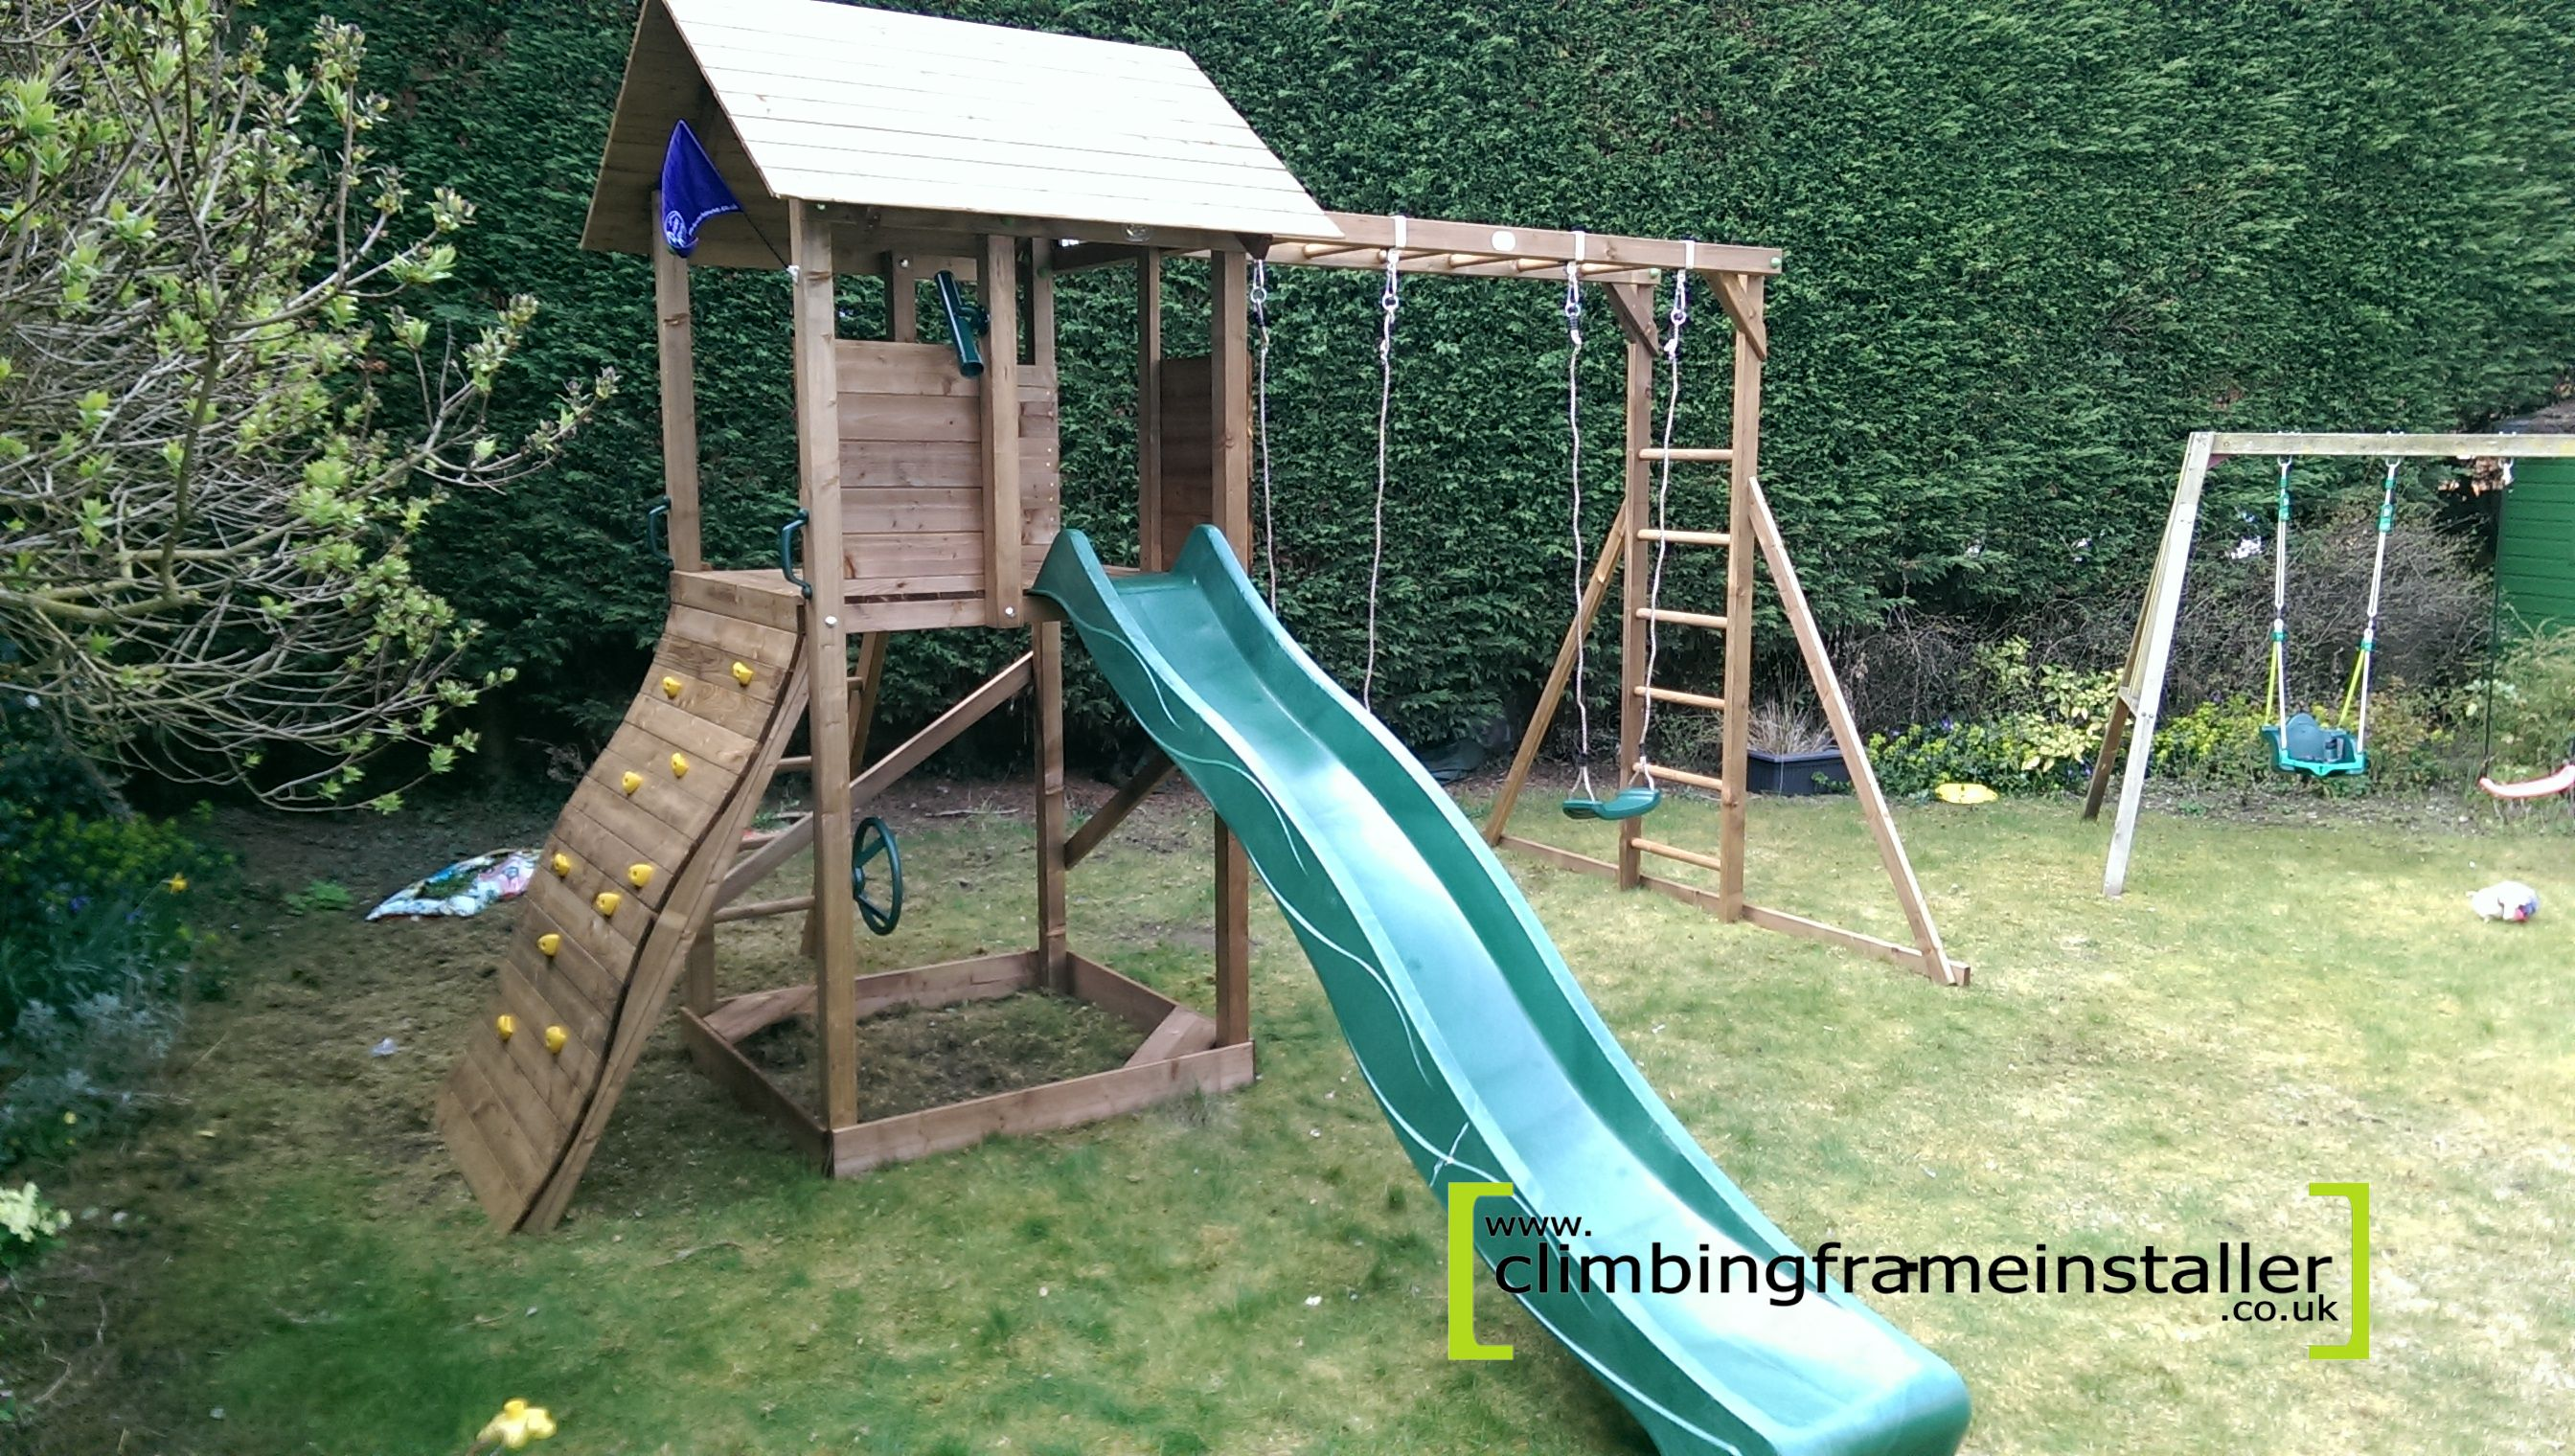 childrens climbing frame installation. Black Bedroom Furniture Sets. Home Design Ideas